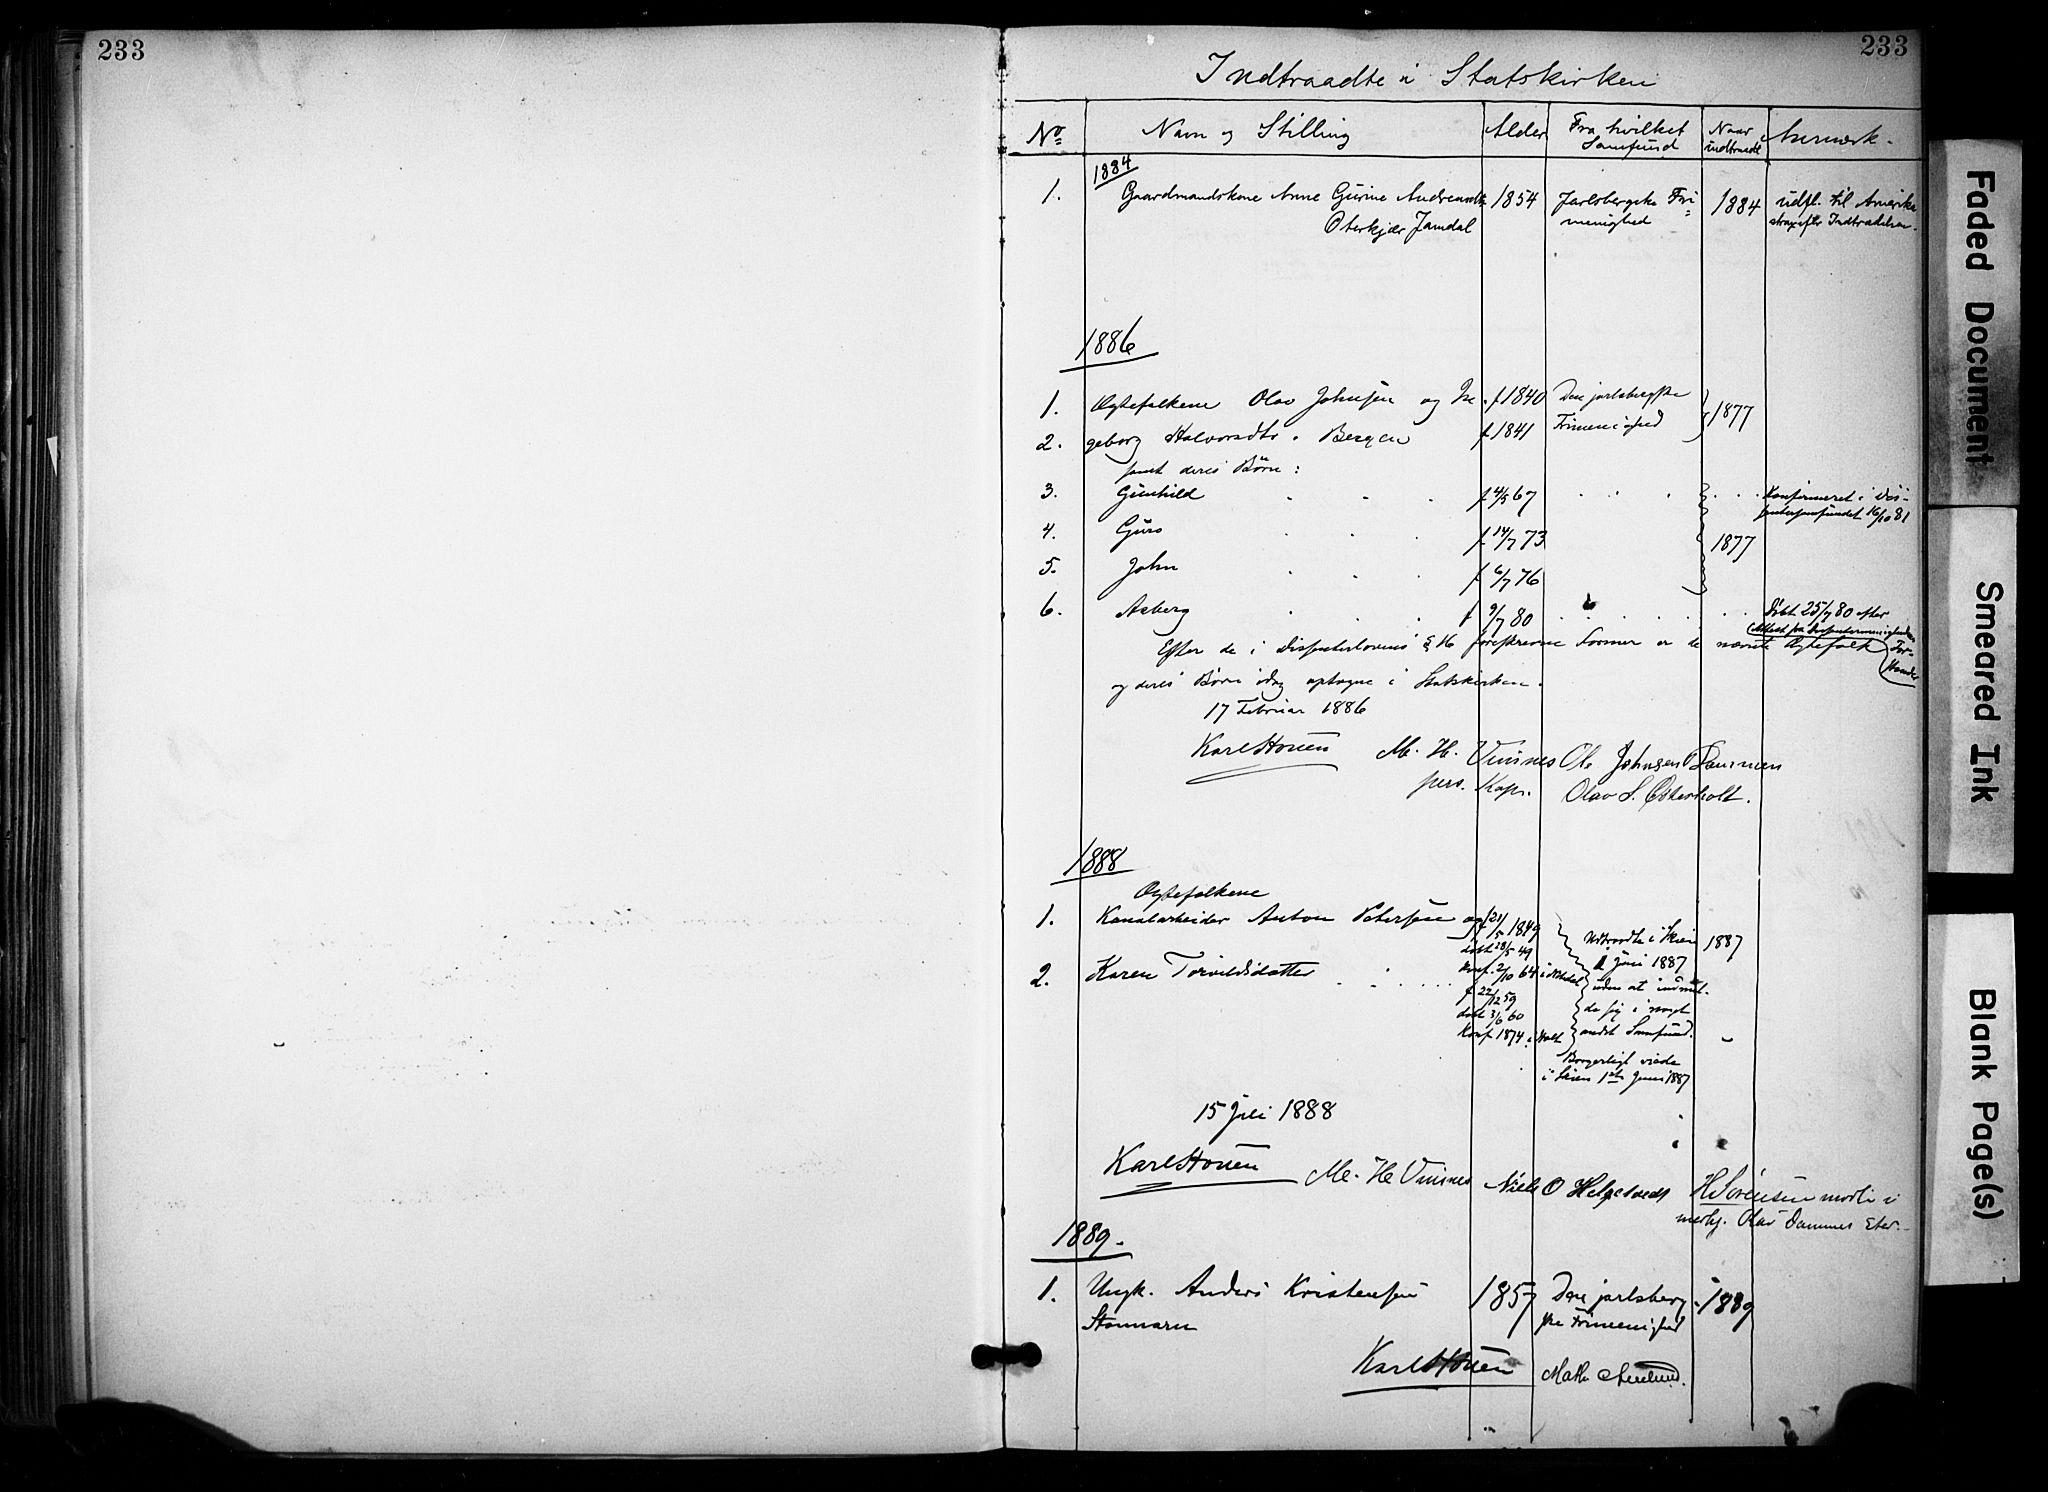 SAKO, Lunde kirkebøker, F/Fa/L0002: Ministerialbok nr. I 2, 1884-1892, s. 233